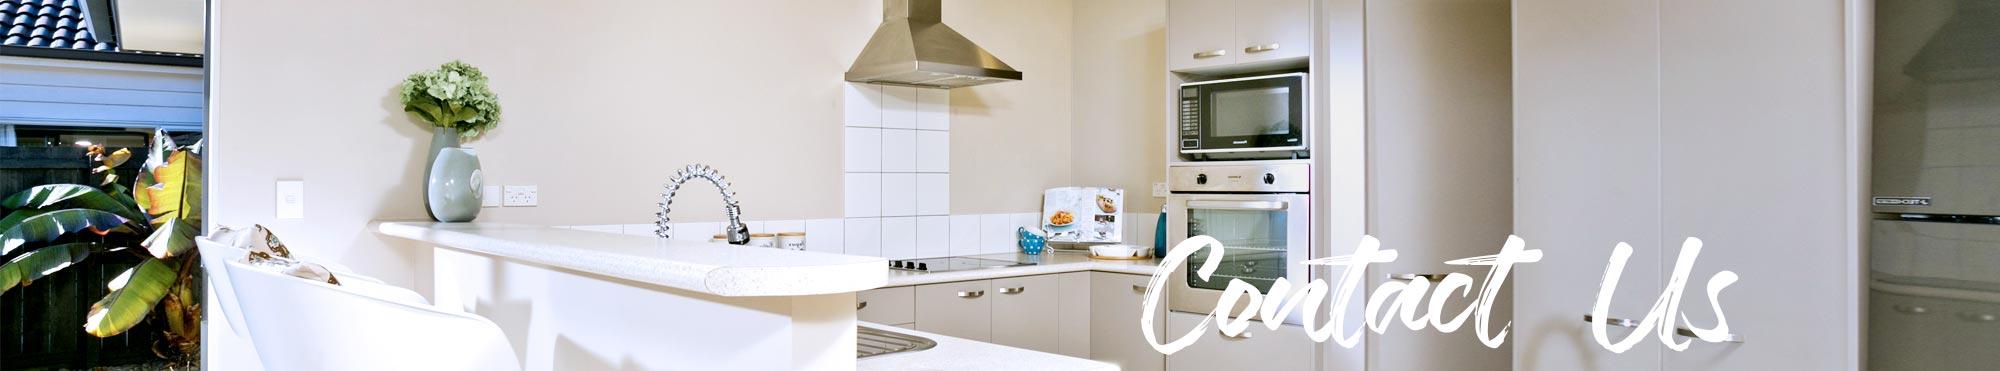 contact-us, Kitchen Renovation, Bathroom Renovation, House Renovation Auckland